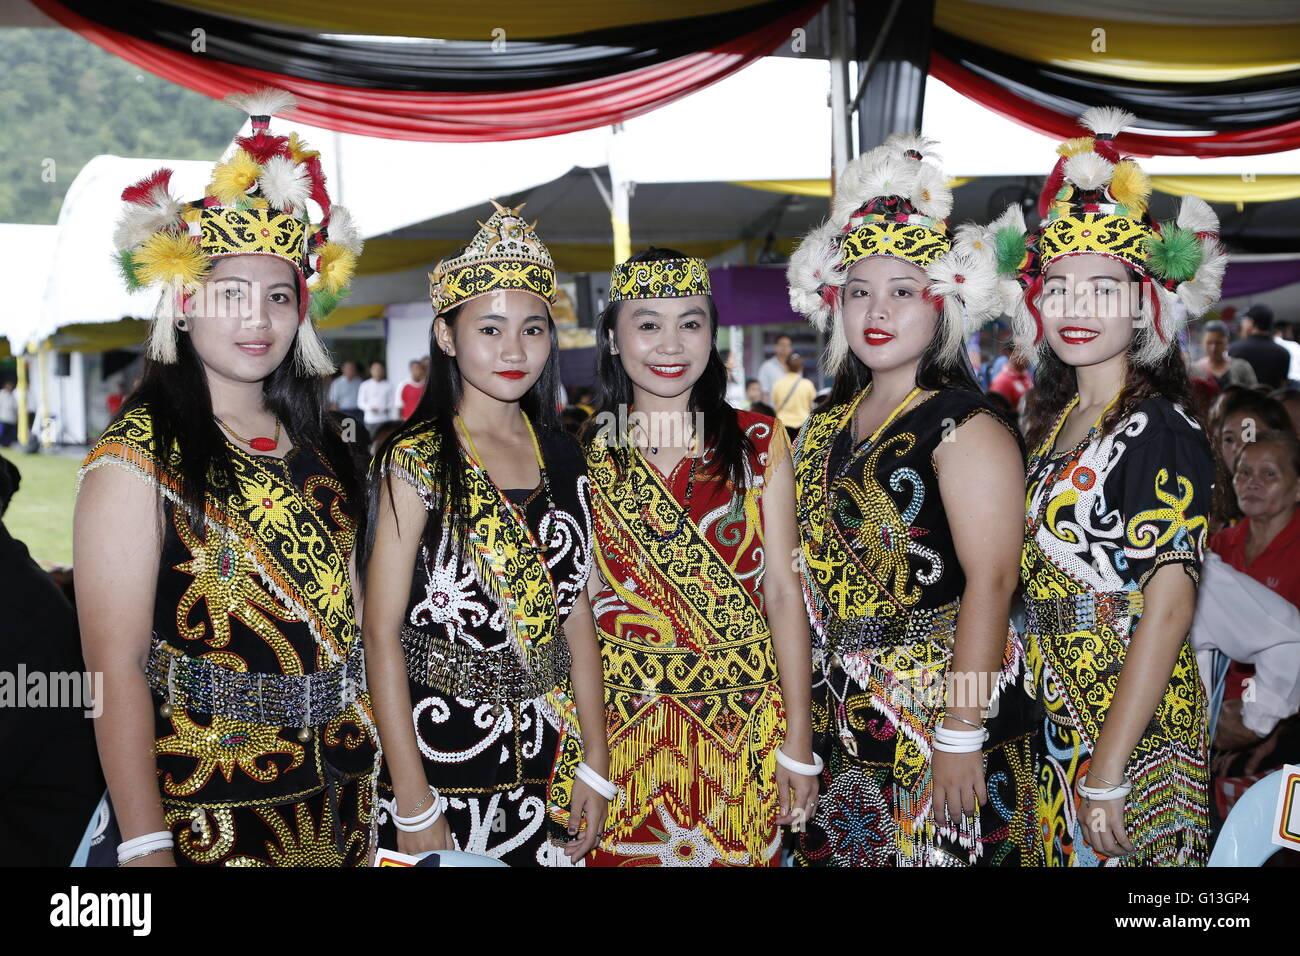 Sarawak Native Beautiful Orang Ulu Ladies In Traditional Costume Stock Photo Alamy